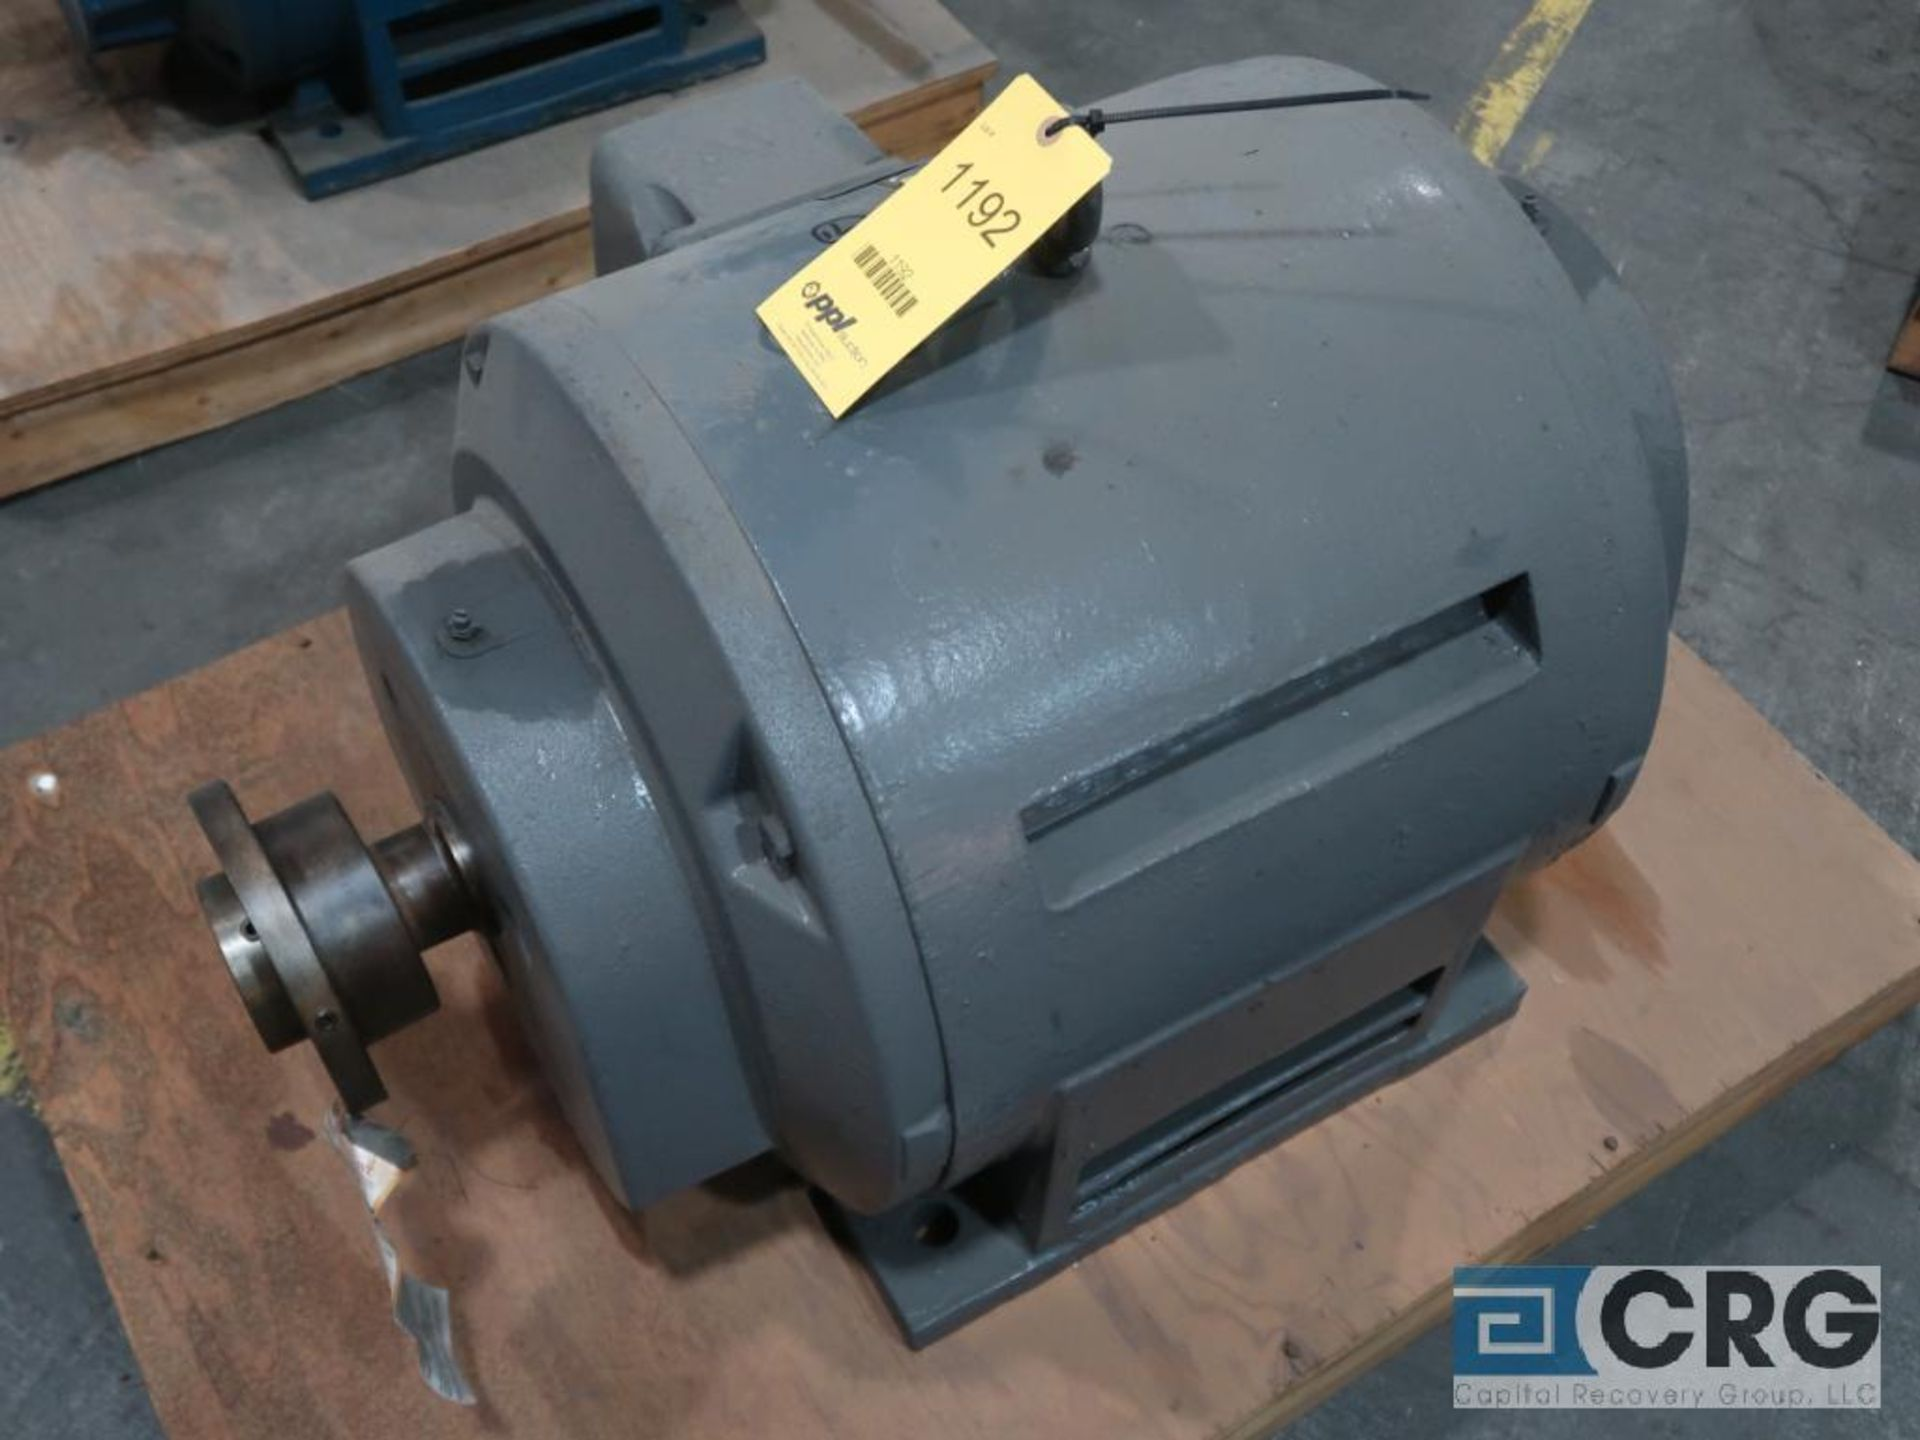 Reliance Duty Master A-C motor, 75 HP, 1,770 RPMs, 440 volt, 3 ph., 405U frame (Finish Building)